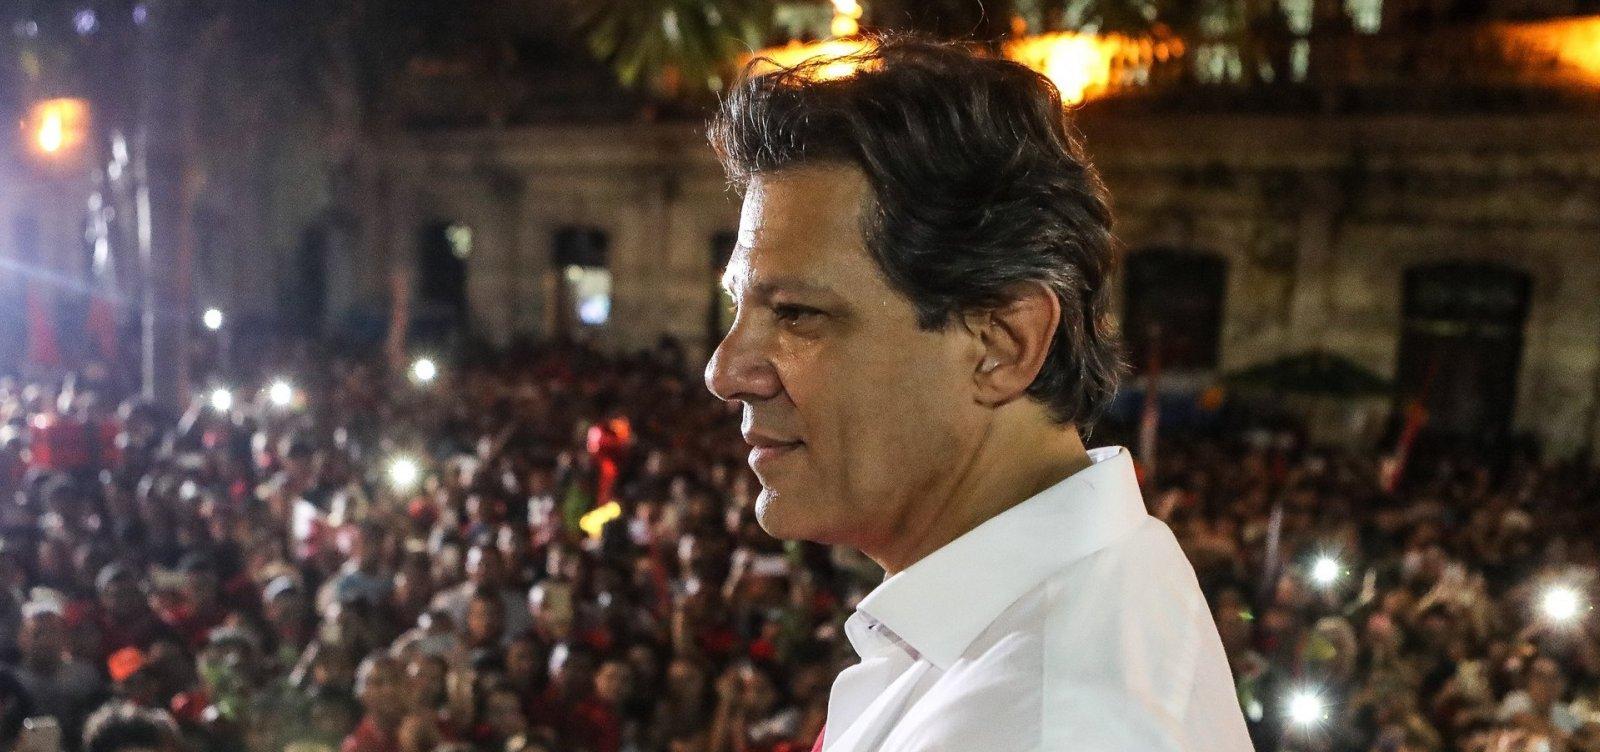 Haddad vai intensificar visitas ao interior de São Paulo para melhorar desempenho